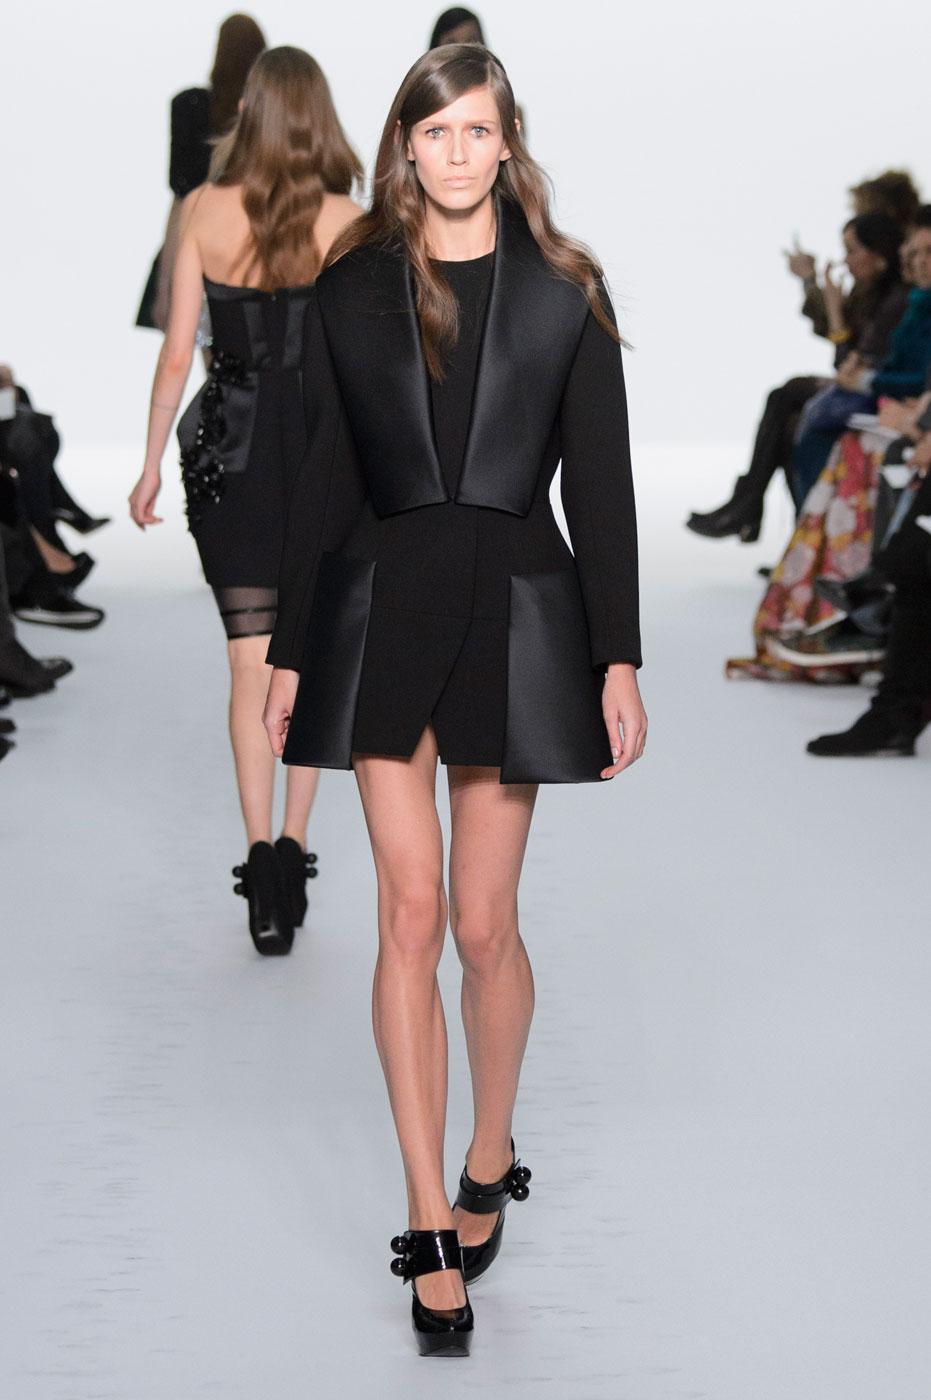 Kayek-fashion-runway-show-haute-couture-paris-spring-summer-2015-the-impression-39